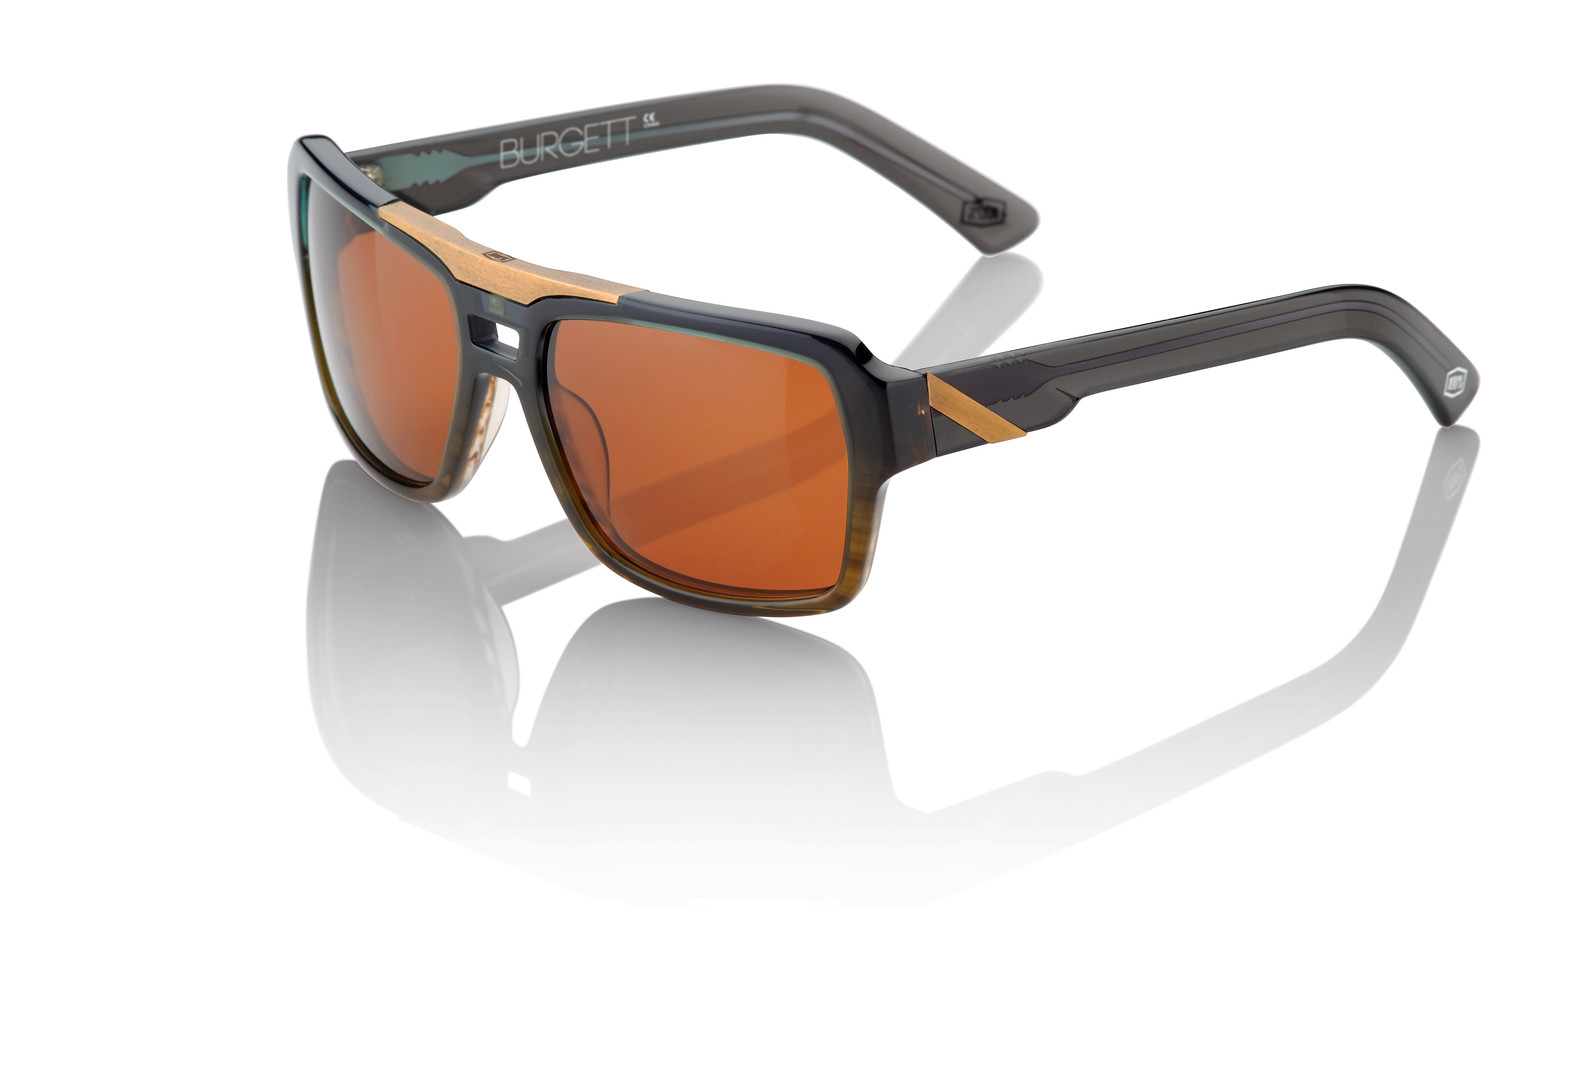 100% Burgett Sunglasses - Carbon Fade